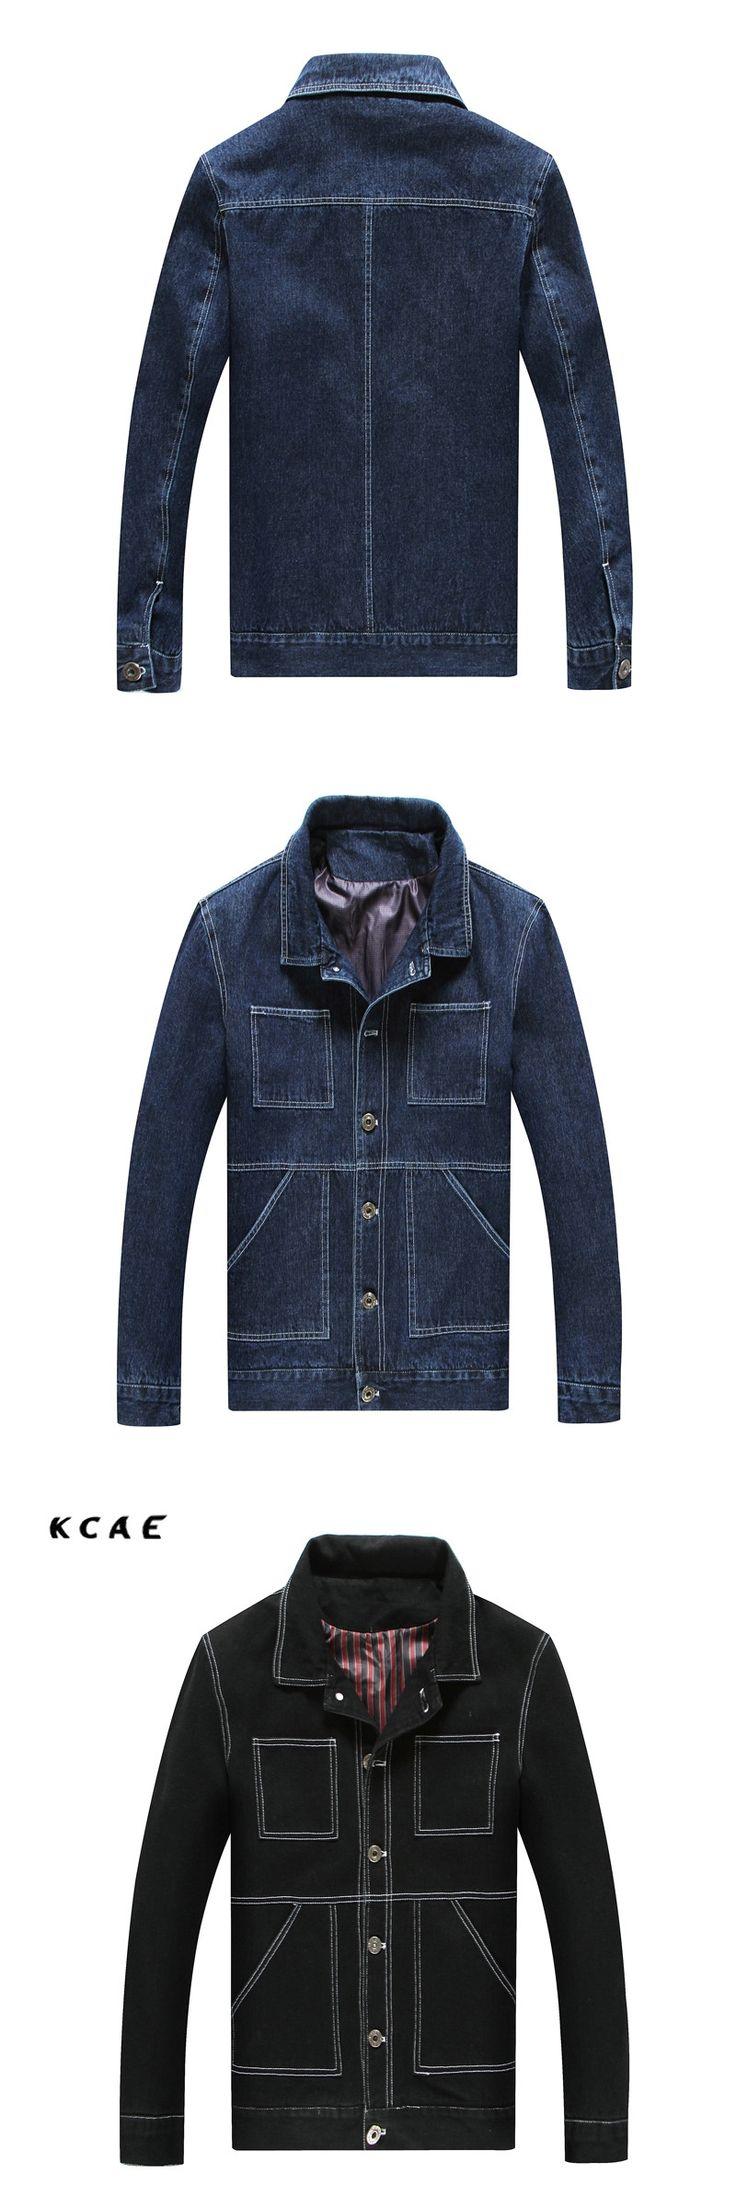 Solid Casual Slim Mens Denim Jacket Plus Size L-8XL  Bomber Jacket Men High Quality Cowboy Men's Jean Jacket Chaqueta Hombre